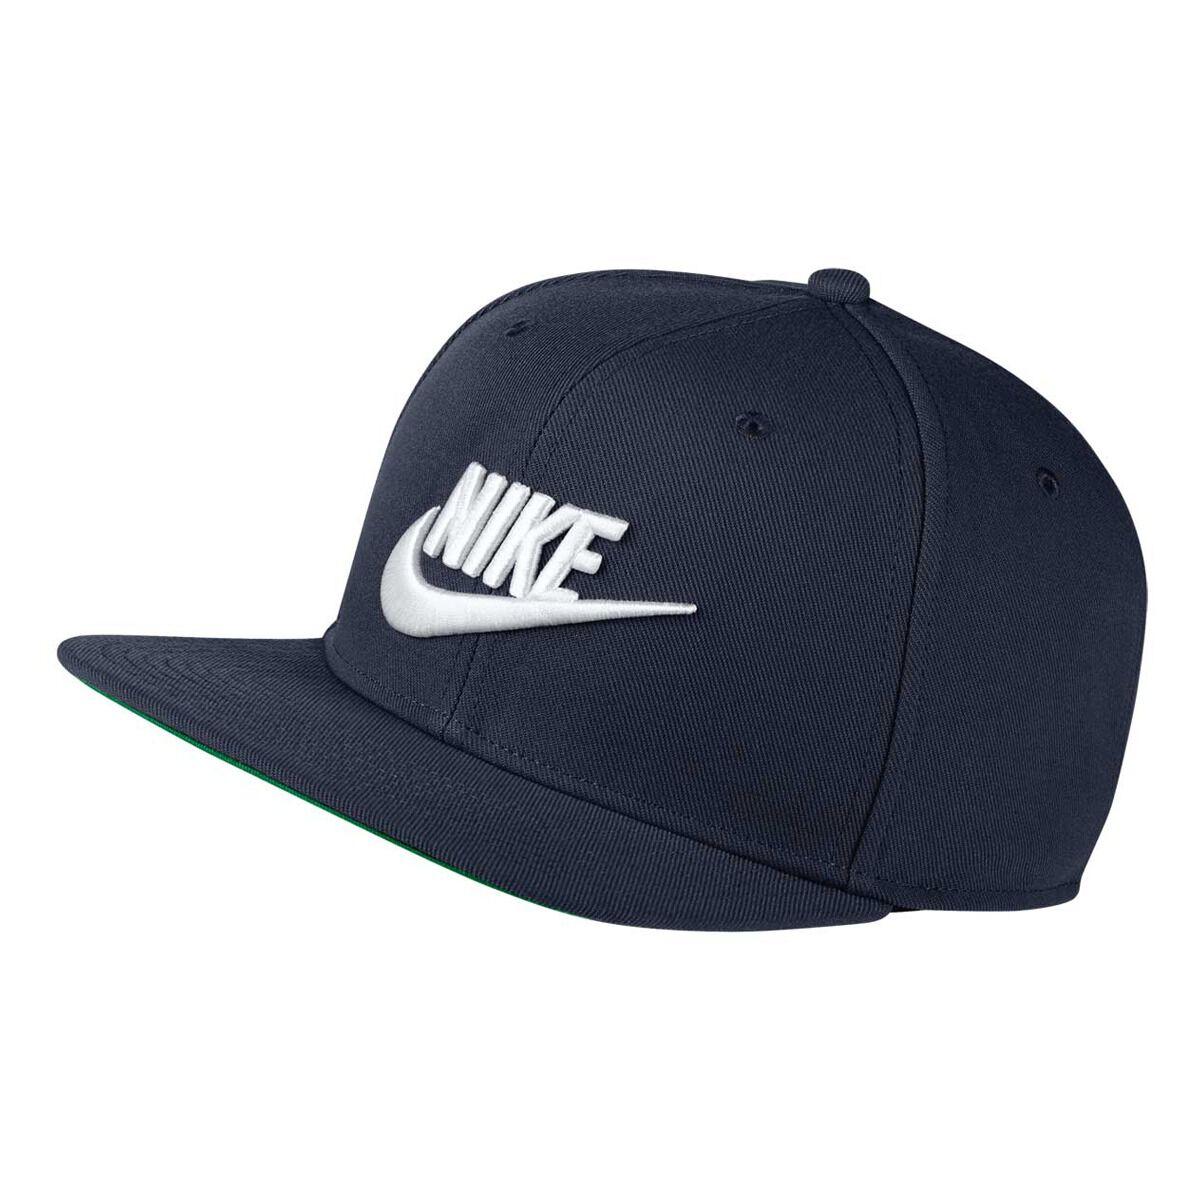 23e226dd5e7 ... official nike unisex sportswear pro cap osfa rebelhi res 24eef a2375